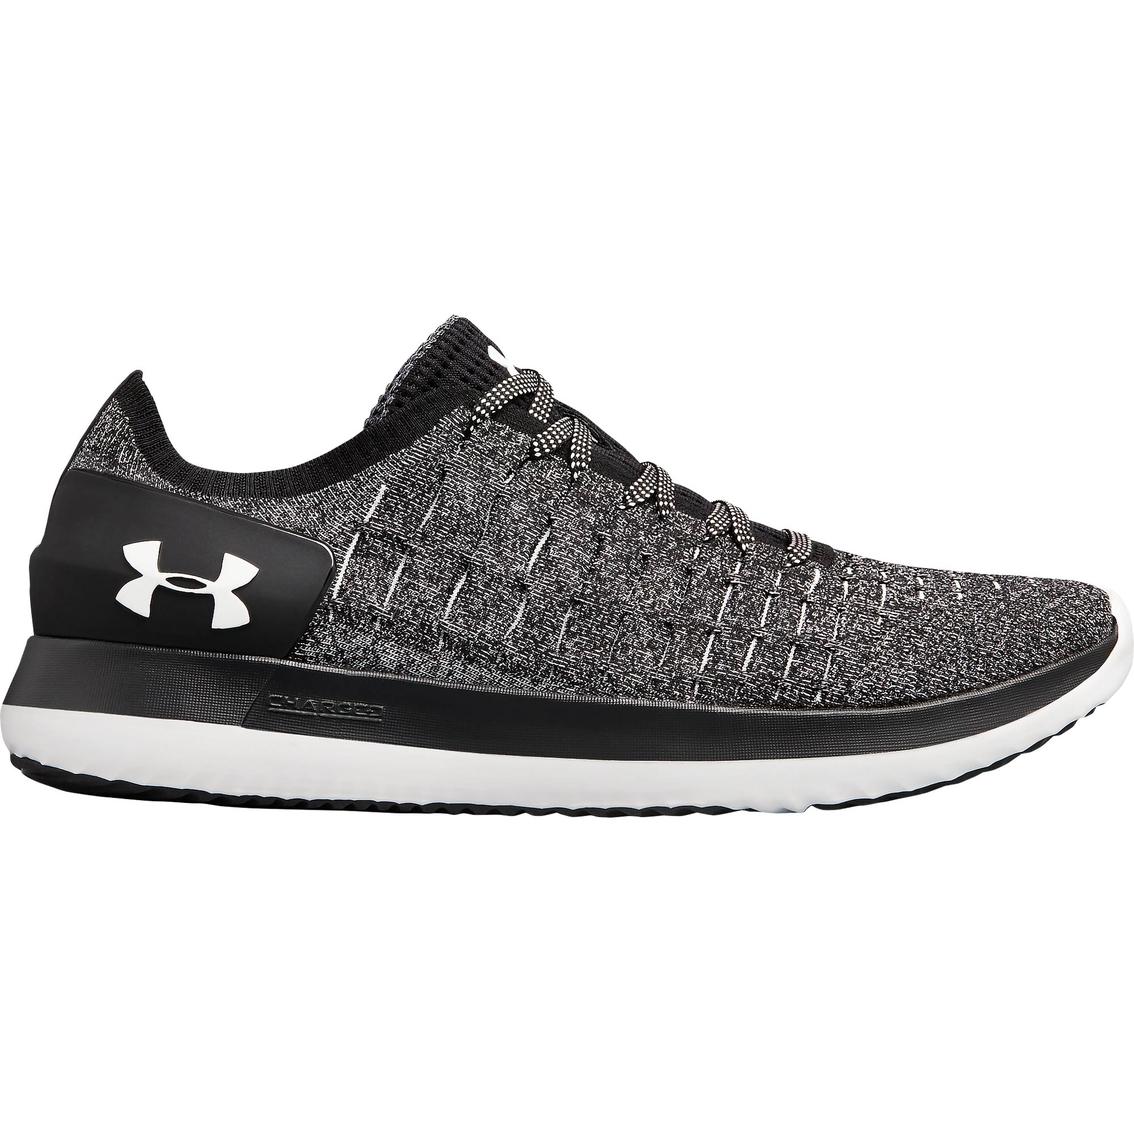 4e02e2eb Under Armour Men's Slingride 2 Running Shoes | Running | Shoes ...